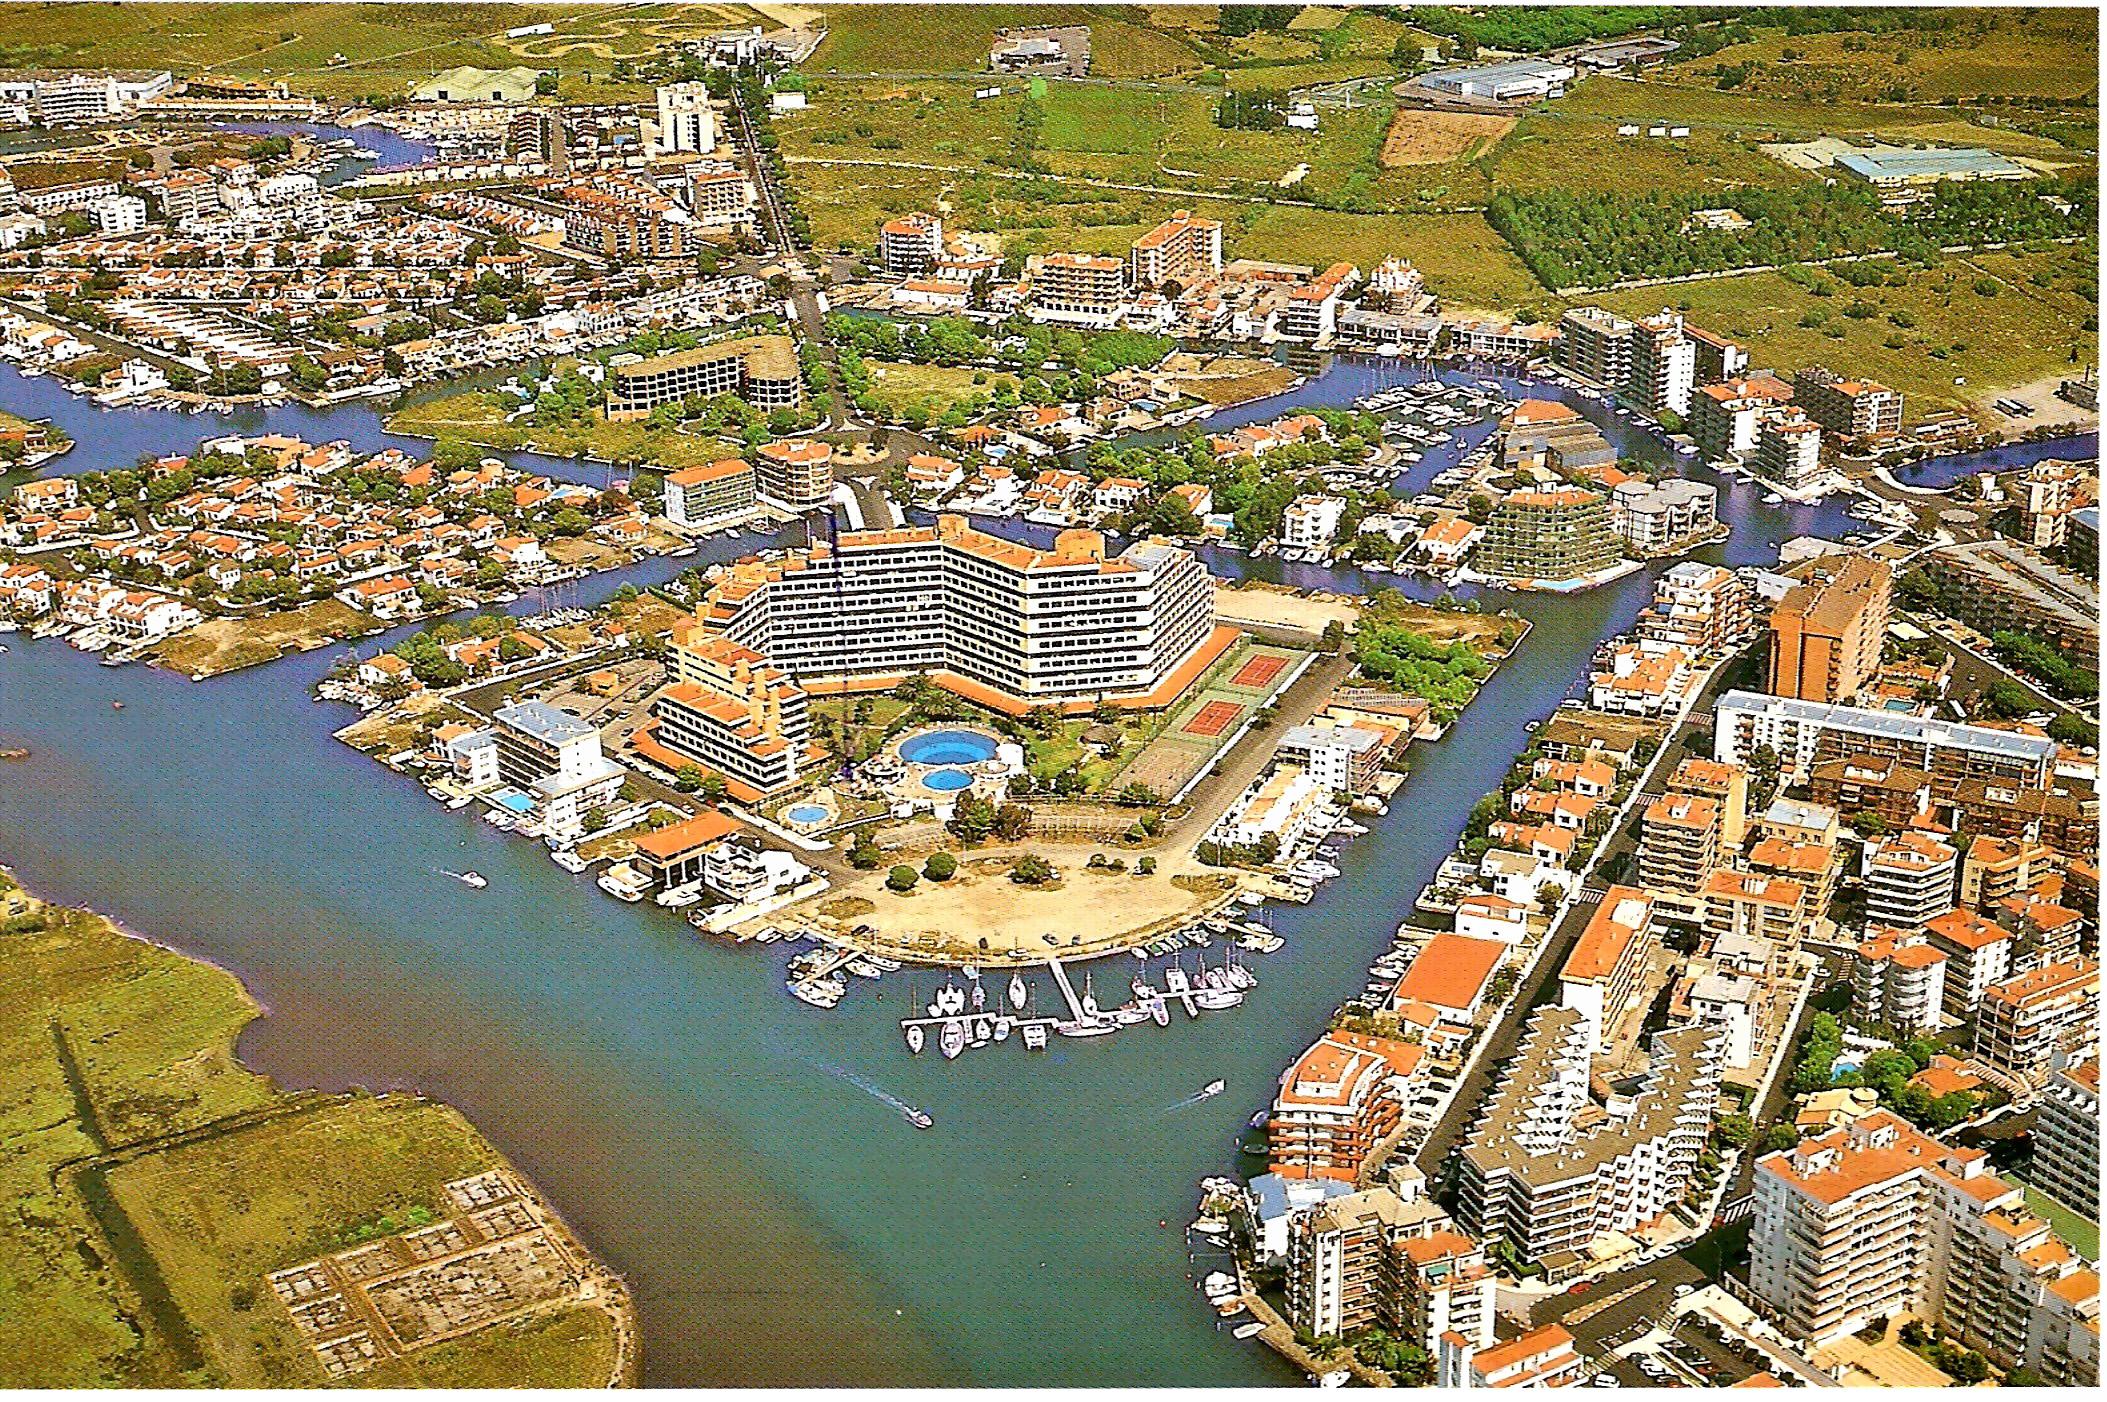 Foto playa Santa Margarida. The Roses island in Santa Margarida, Spain (Post card from 1975 year )